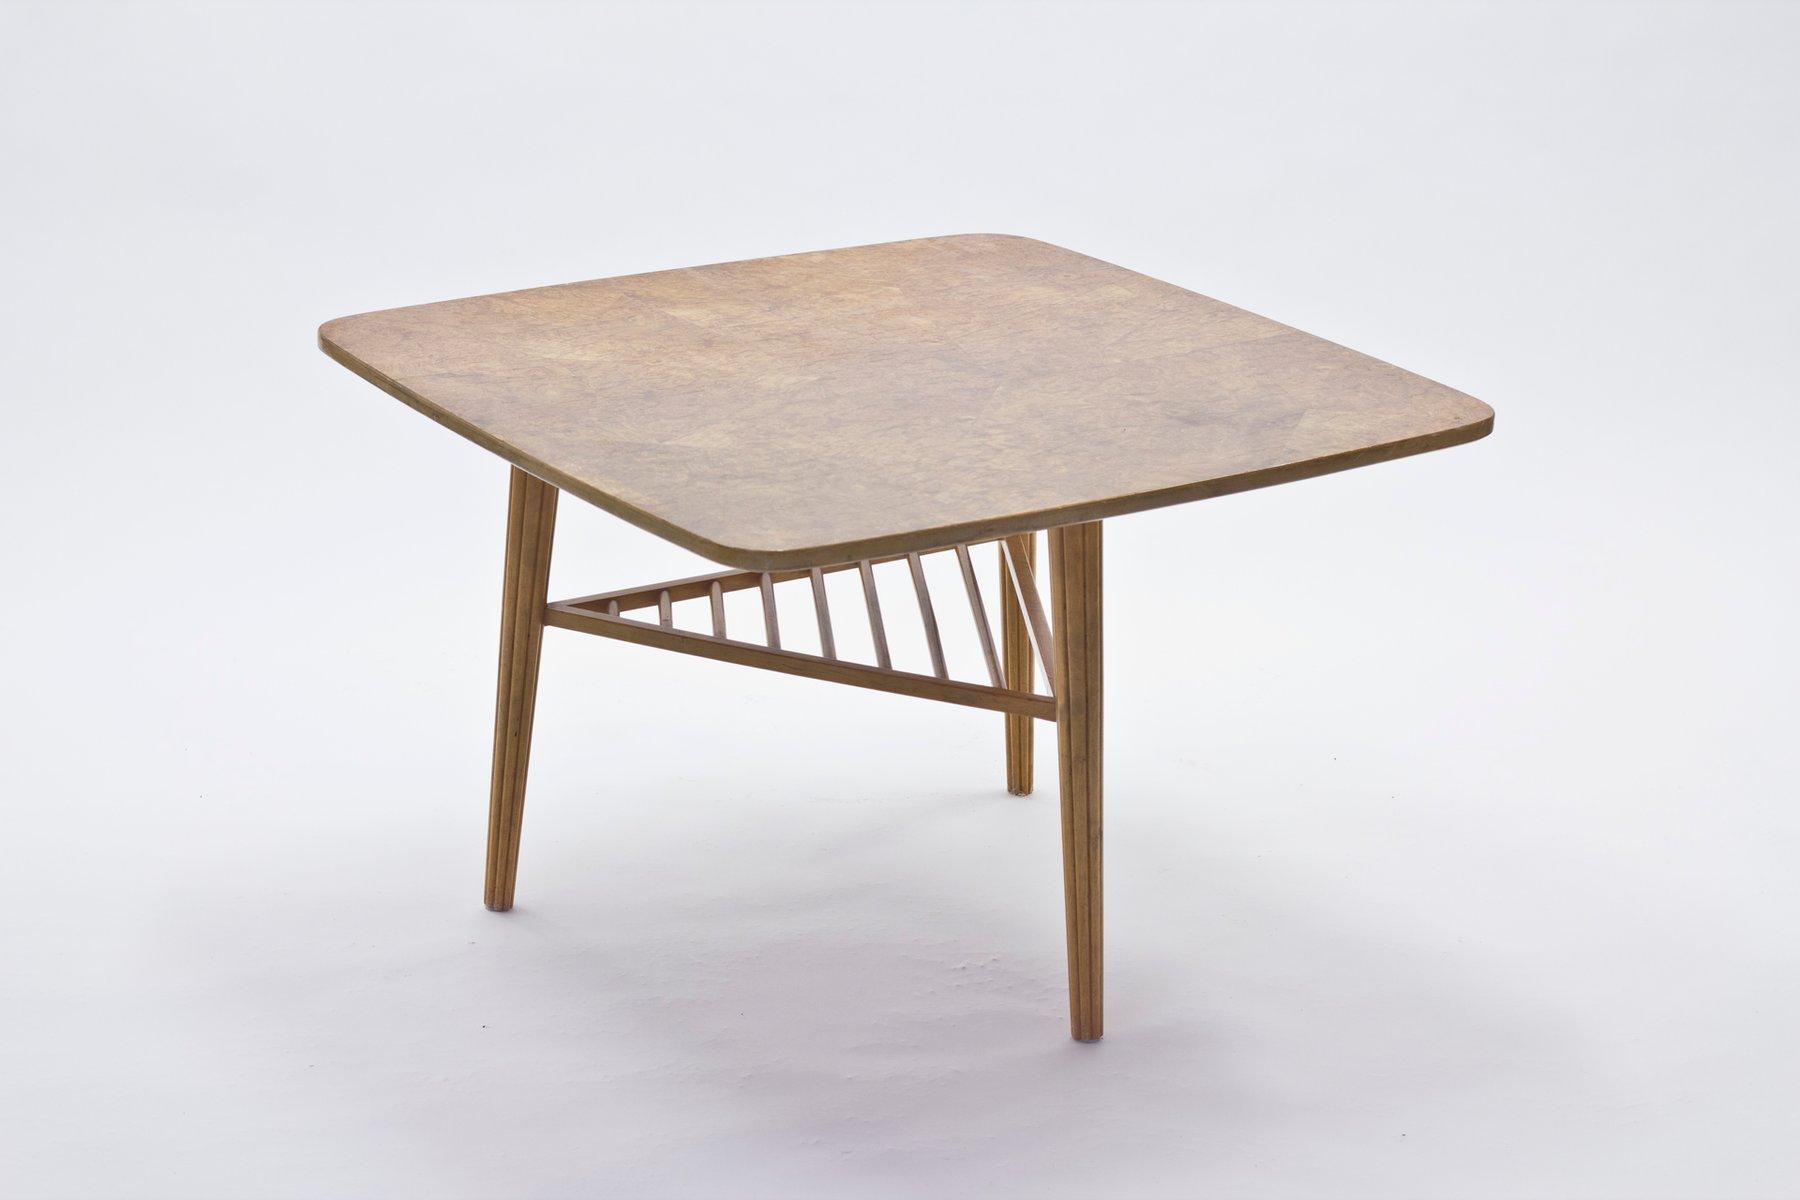 table basse avec dessus en placage de racine 1940s en vente sur pamono. Black Bedroom Furniture Sets. Home Design Ideas